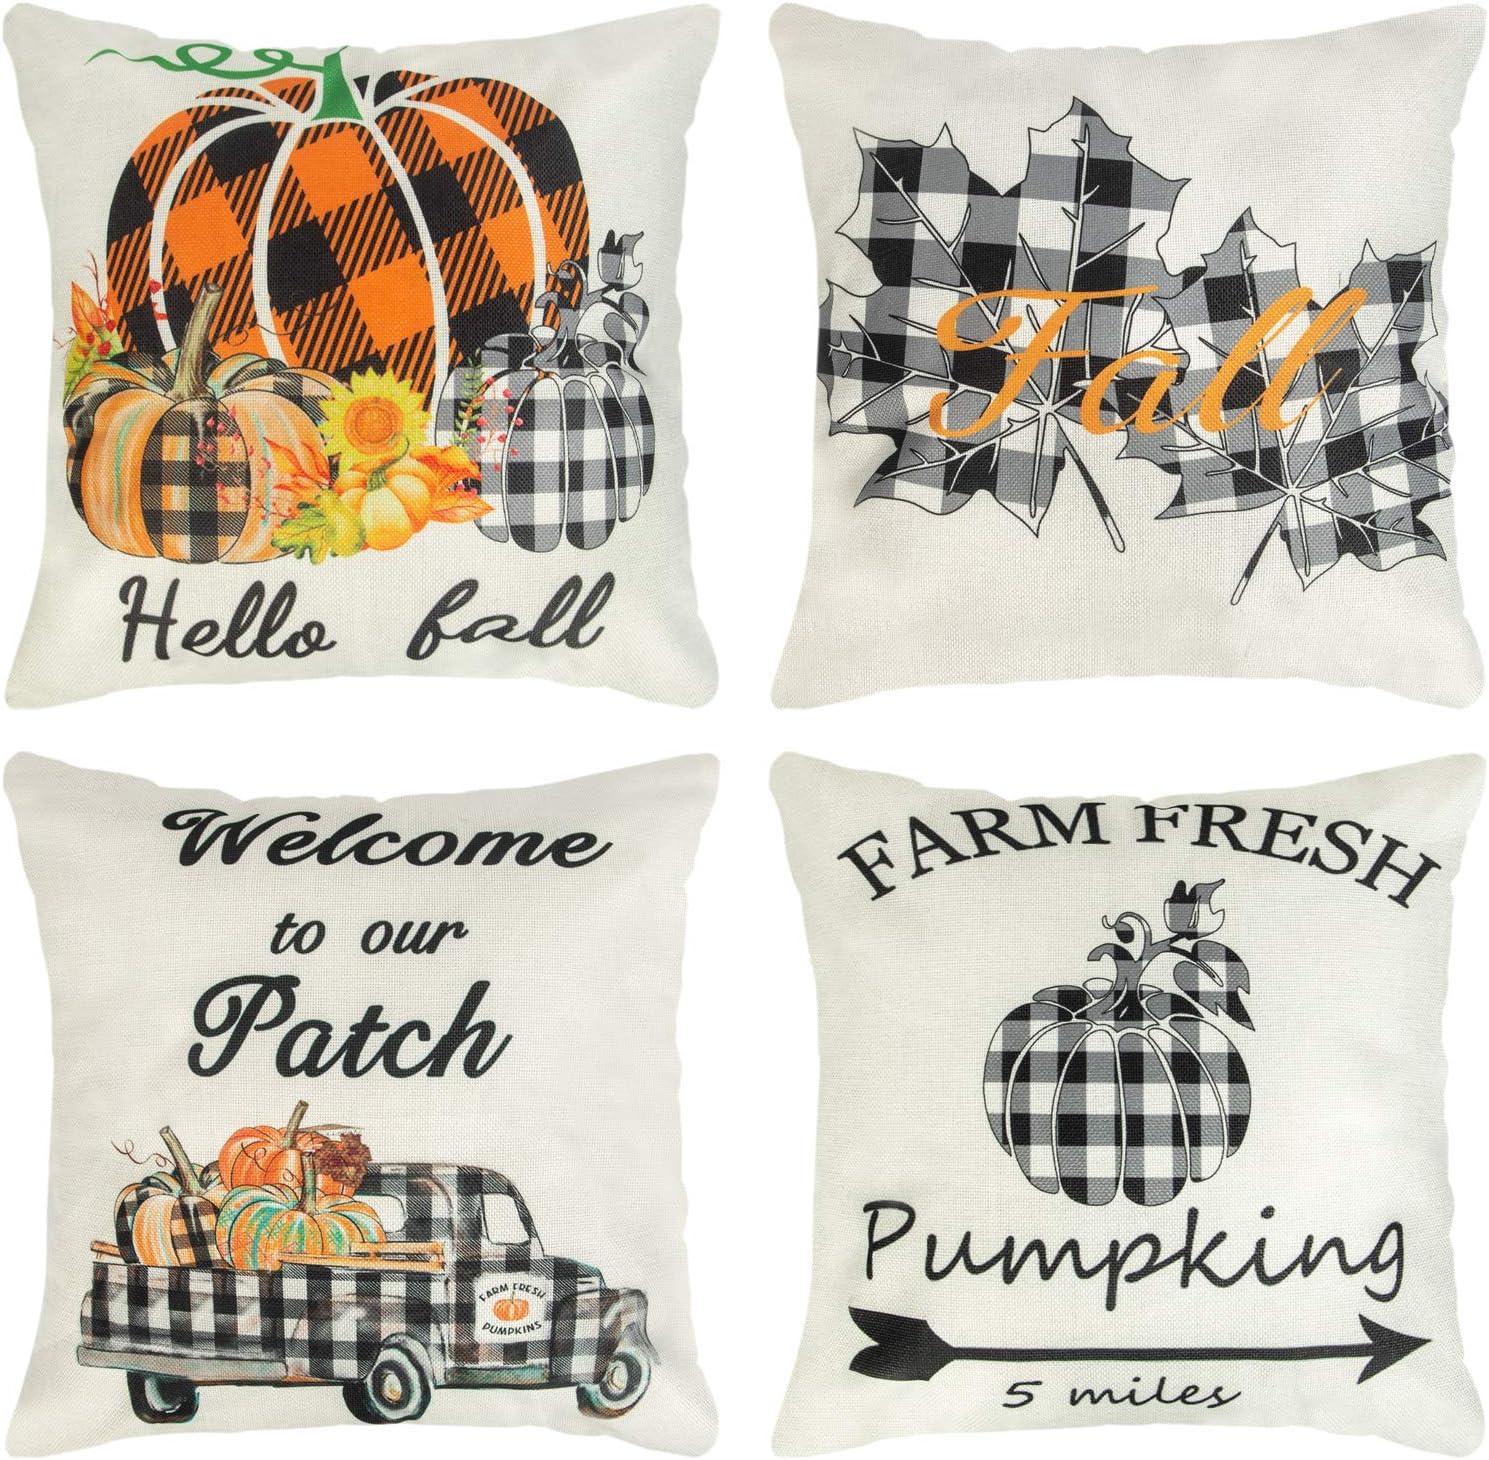 Ouddy Fall Pillow Cover 18 x 18 Set of 4, Pumpkin Truck Leaves Farmhouse Buffalo Plaid Throw Pillow Cushion Cases for Fall Thanksgiving Autumn Outdoor Decor